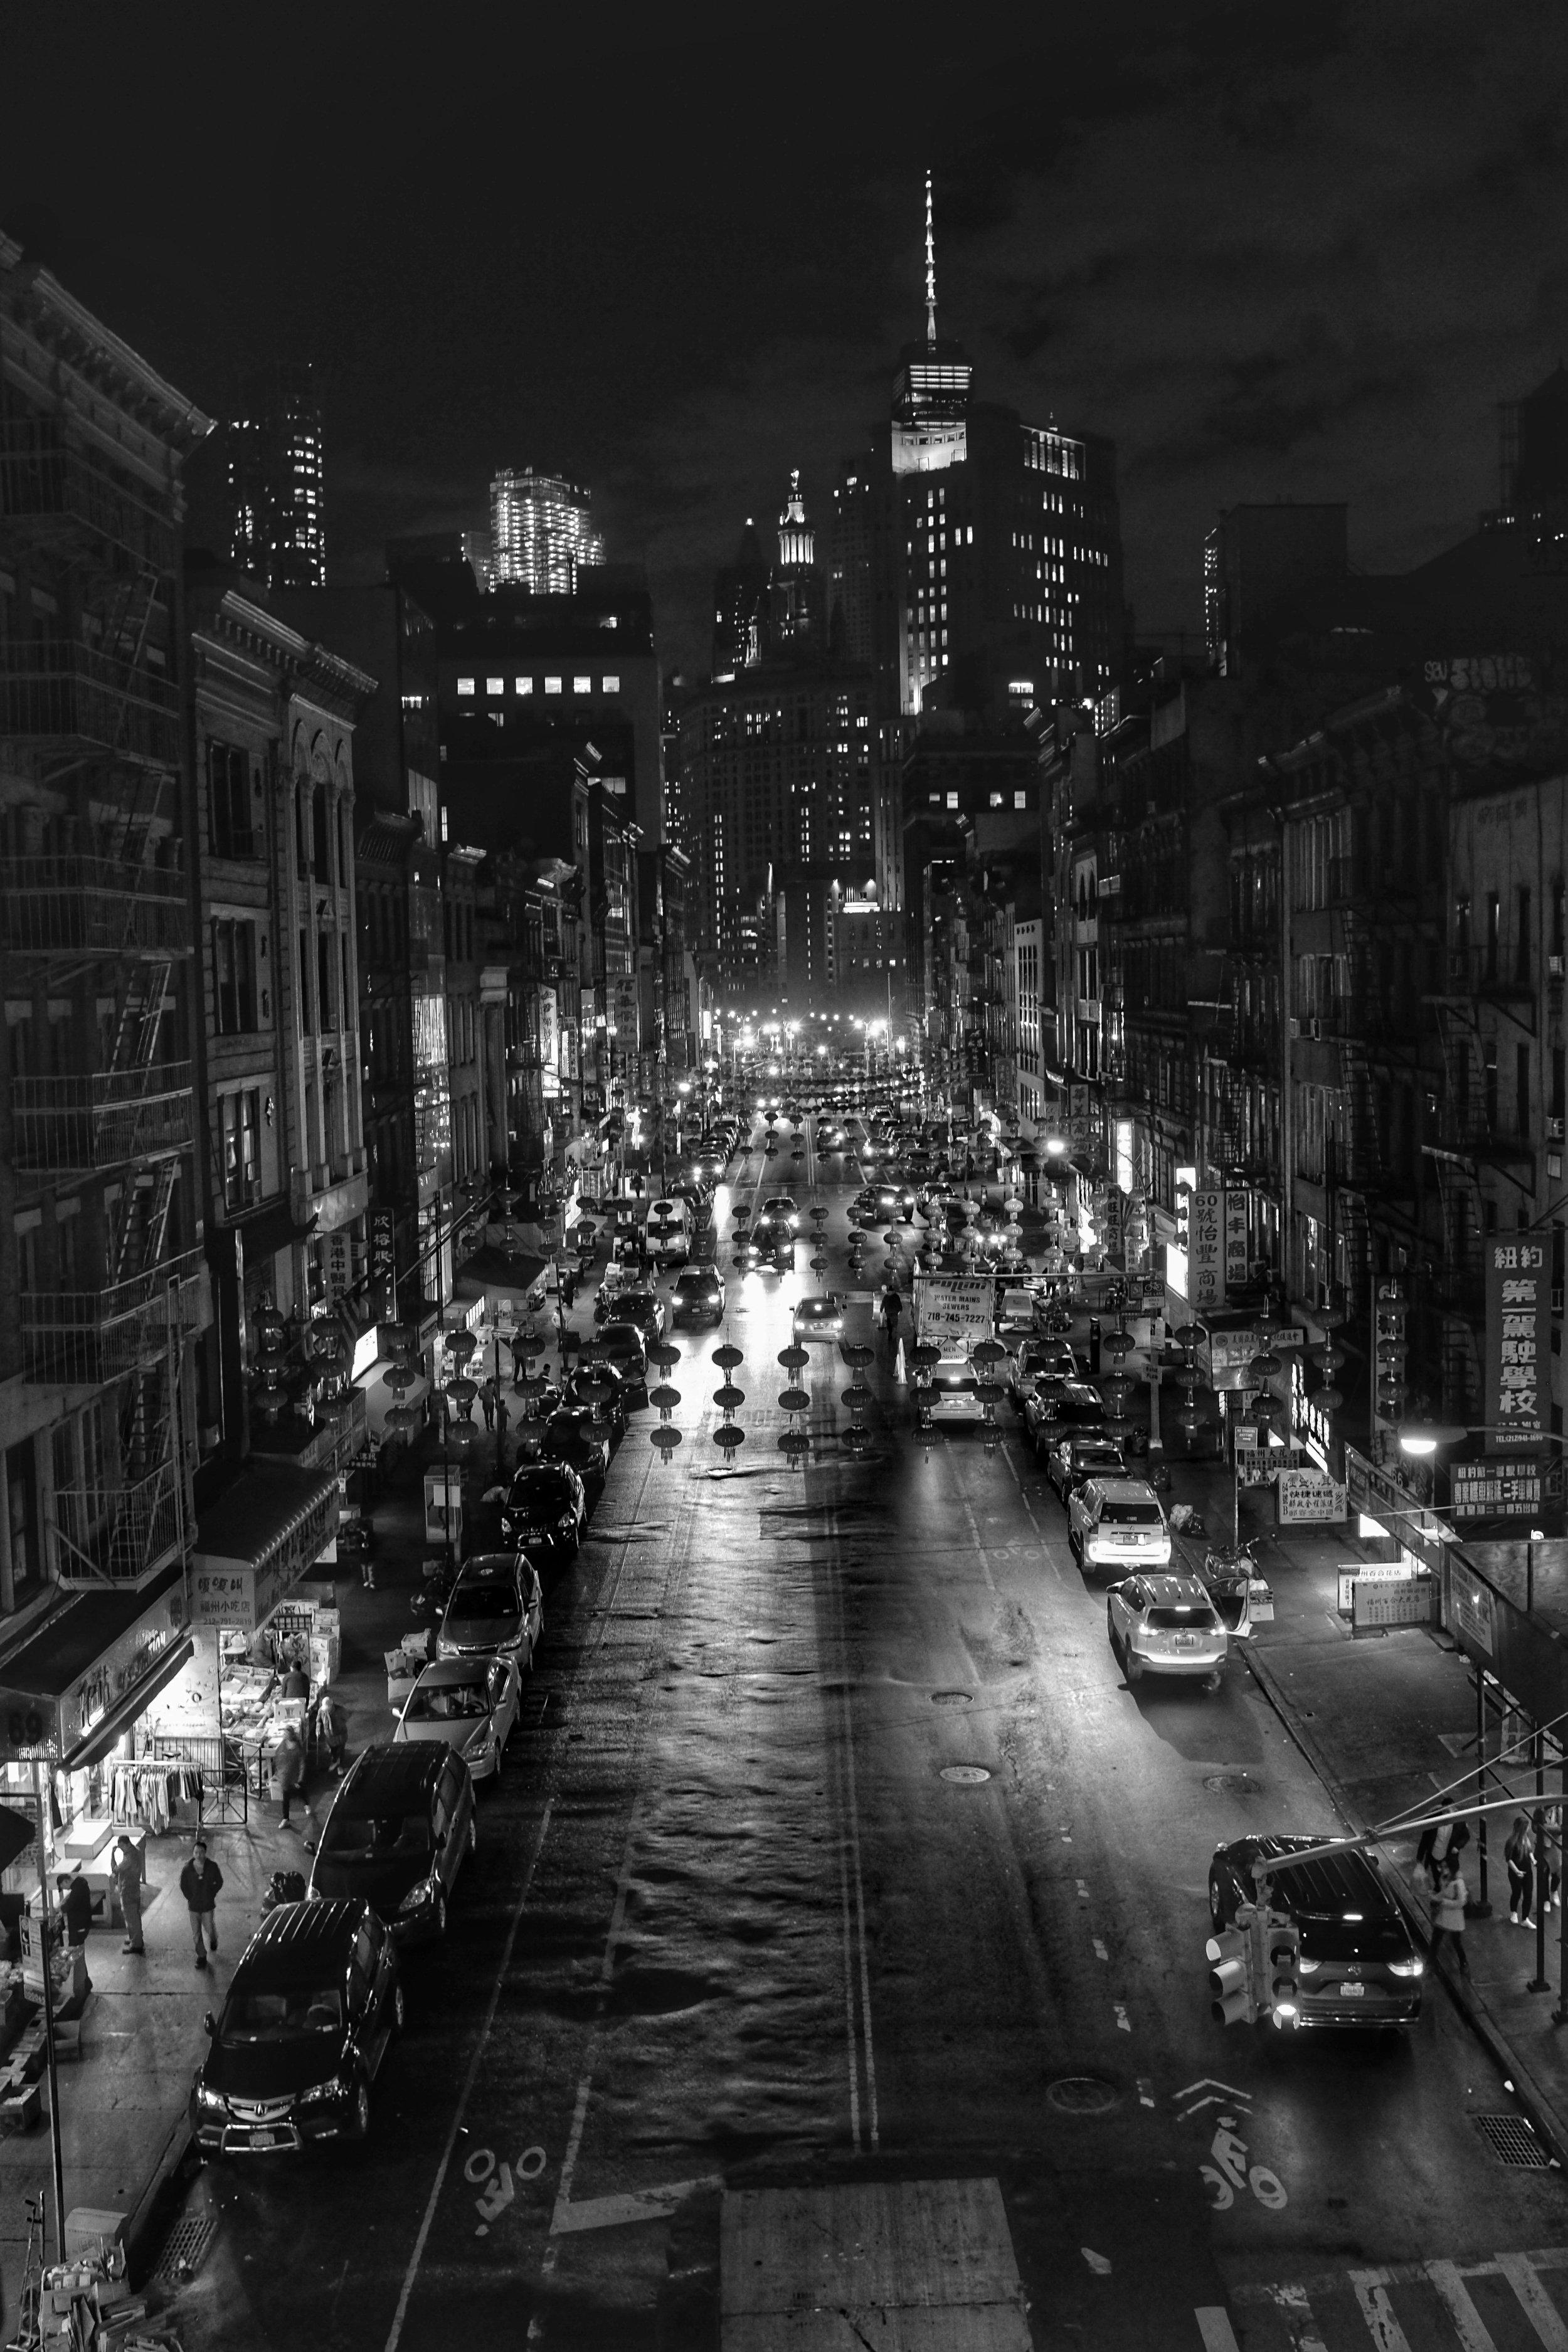 East Broadway. Chinatown. New York City. 2017.